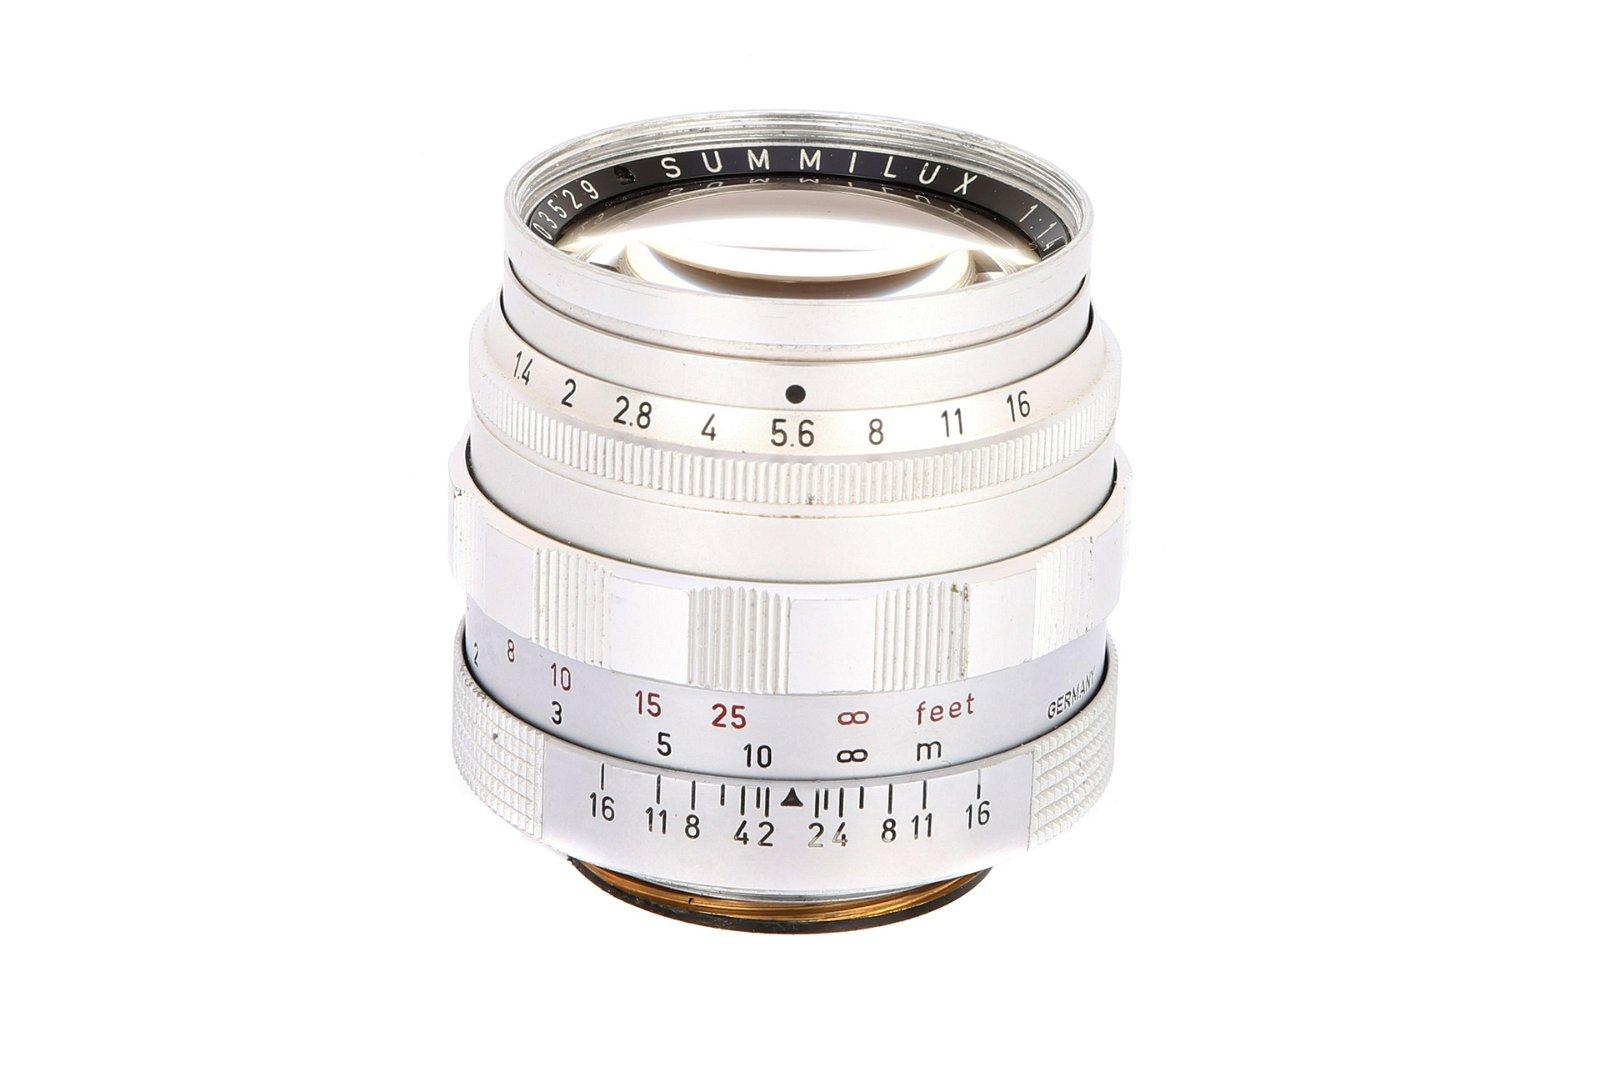 * A Leitz Summilux f/1.4 50mm Lens,